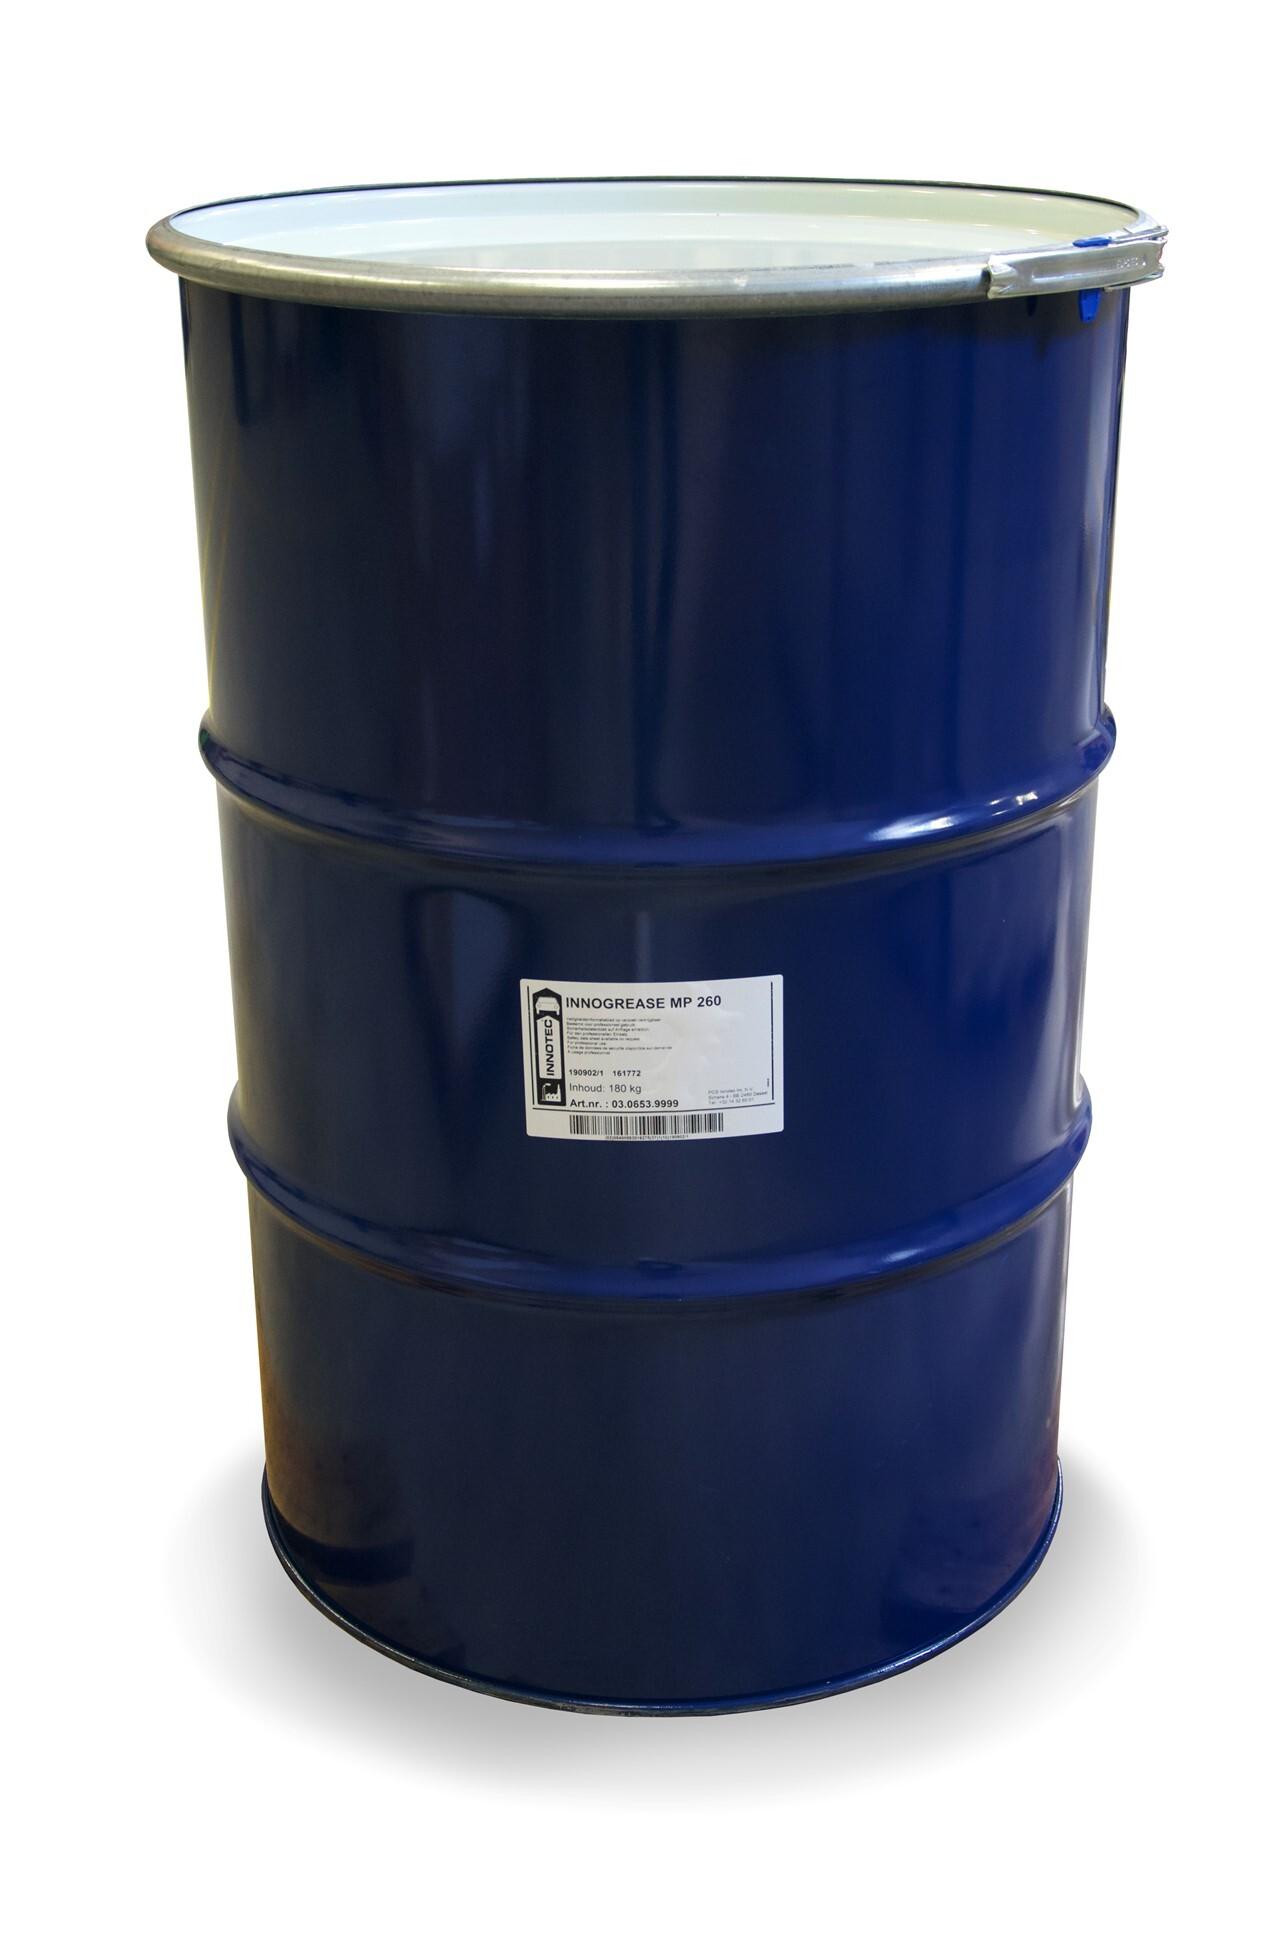 1777 Innogrease MP260 180kg vat